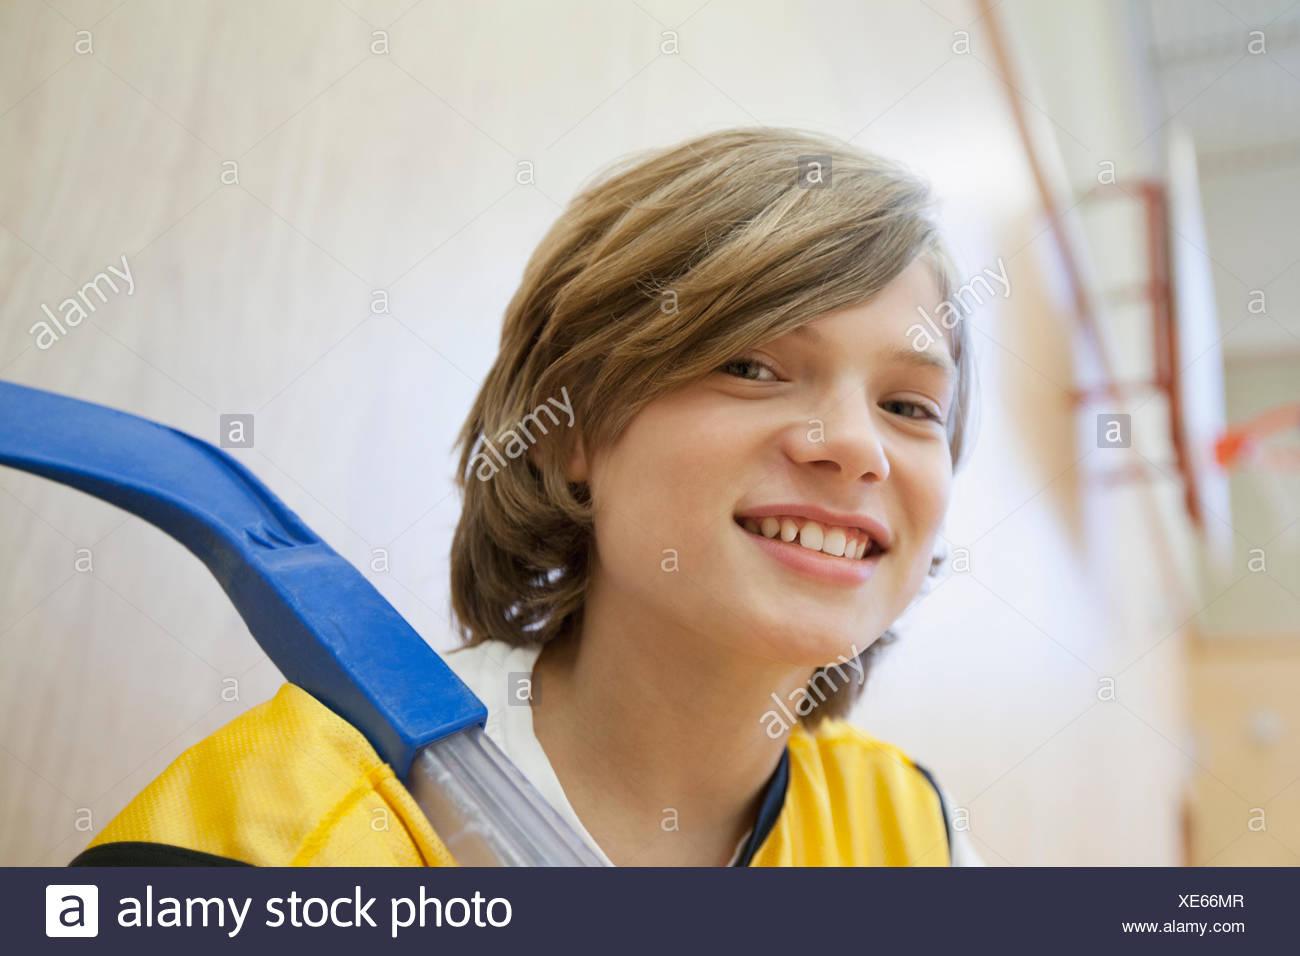 Portrait of male, floor hockey player. - Stock Image